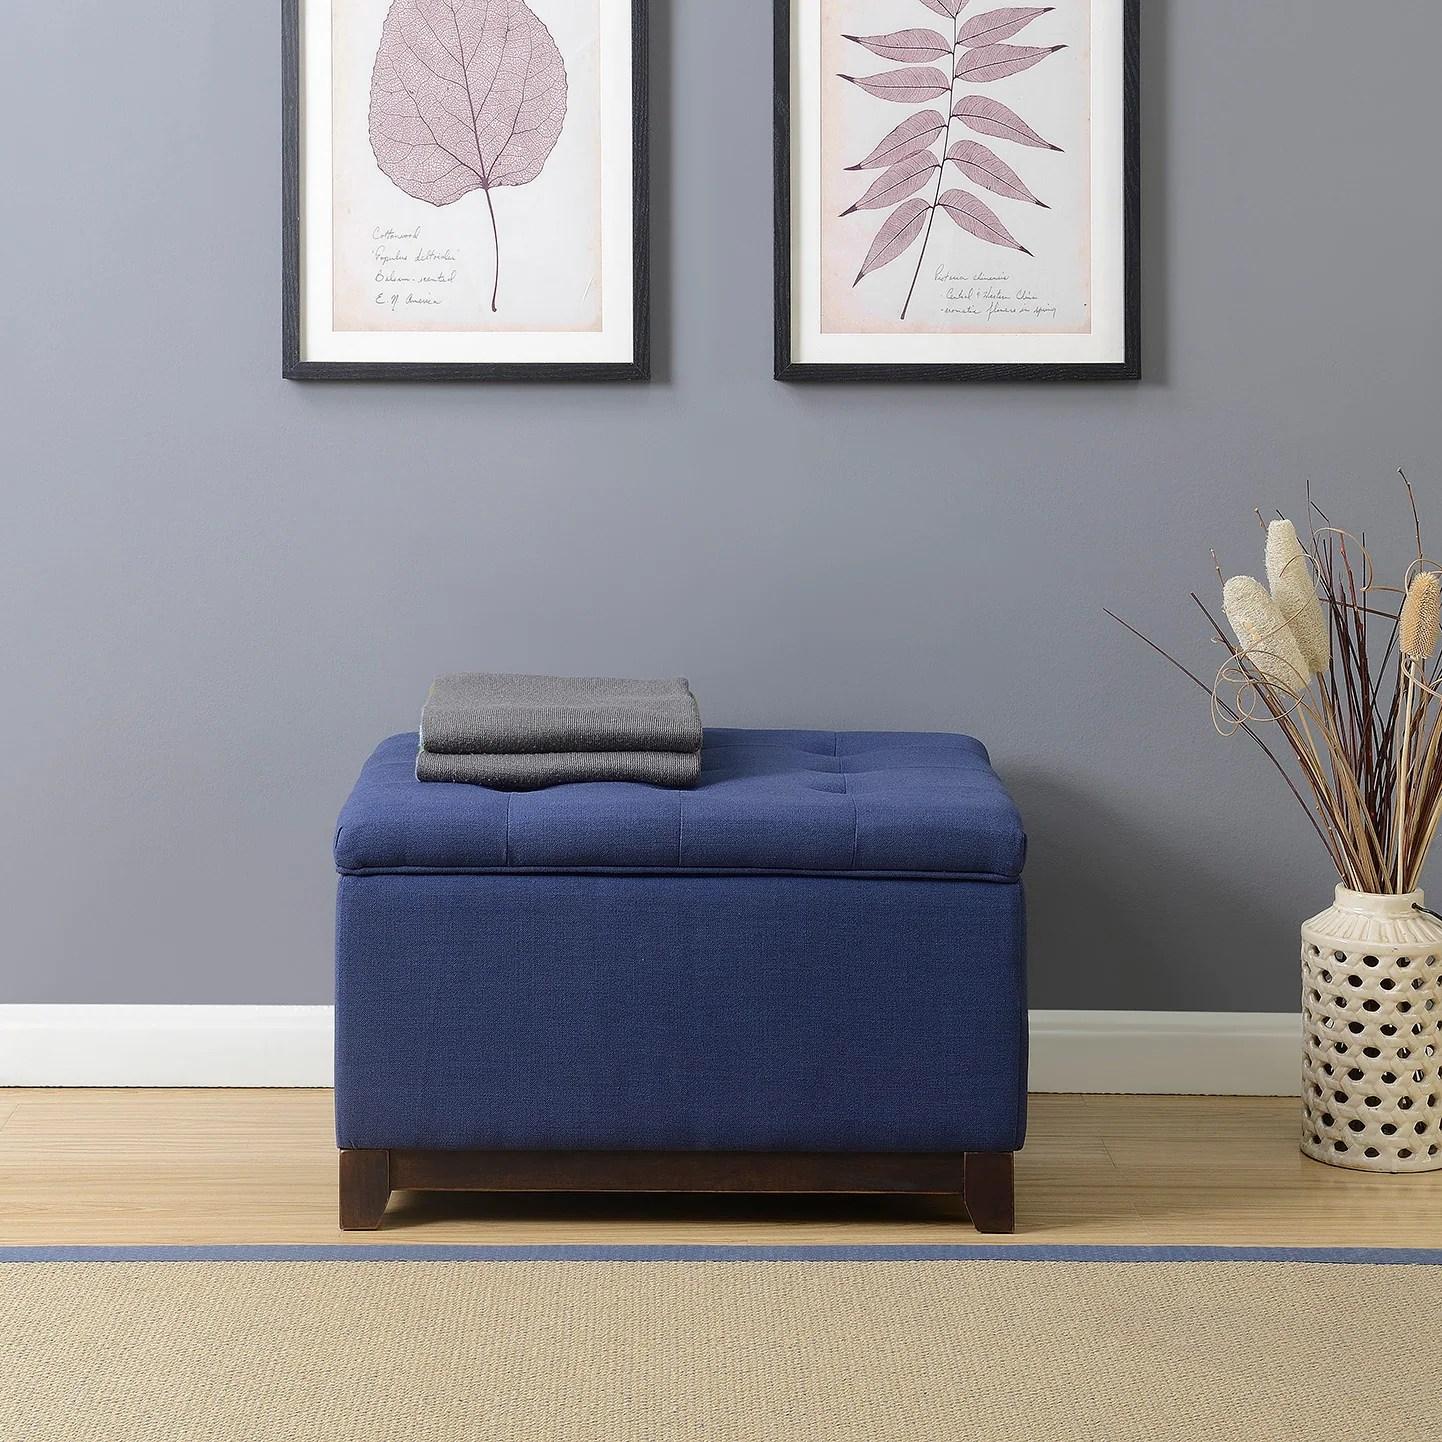 belleze linen ottoman storage bench stool footrest tufted navy blue